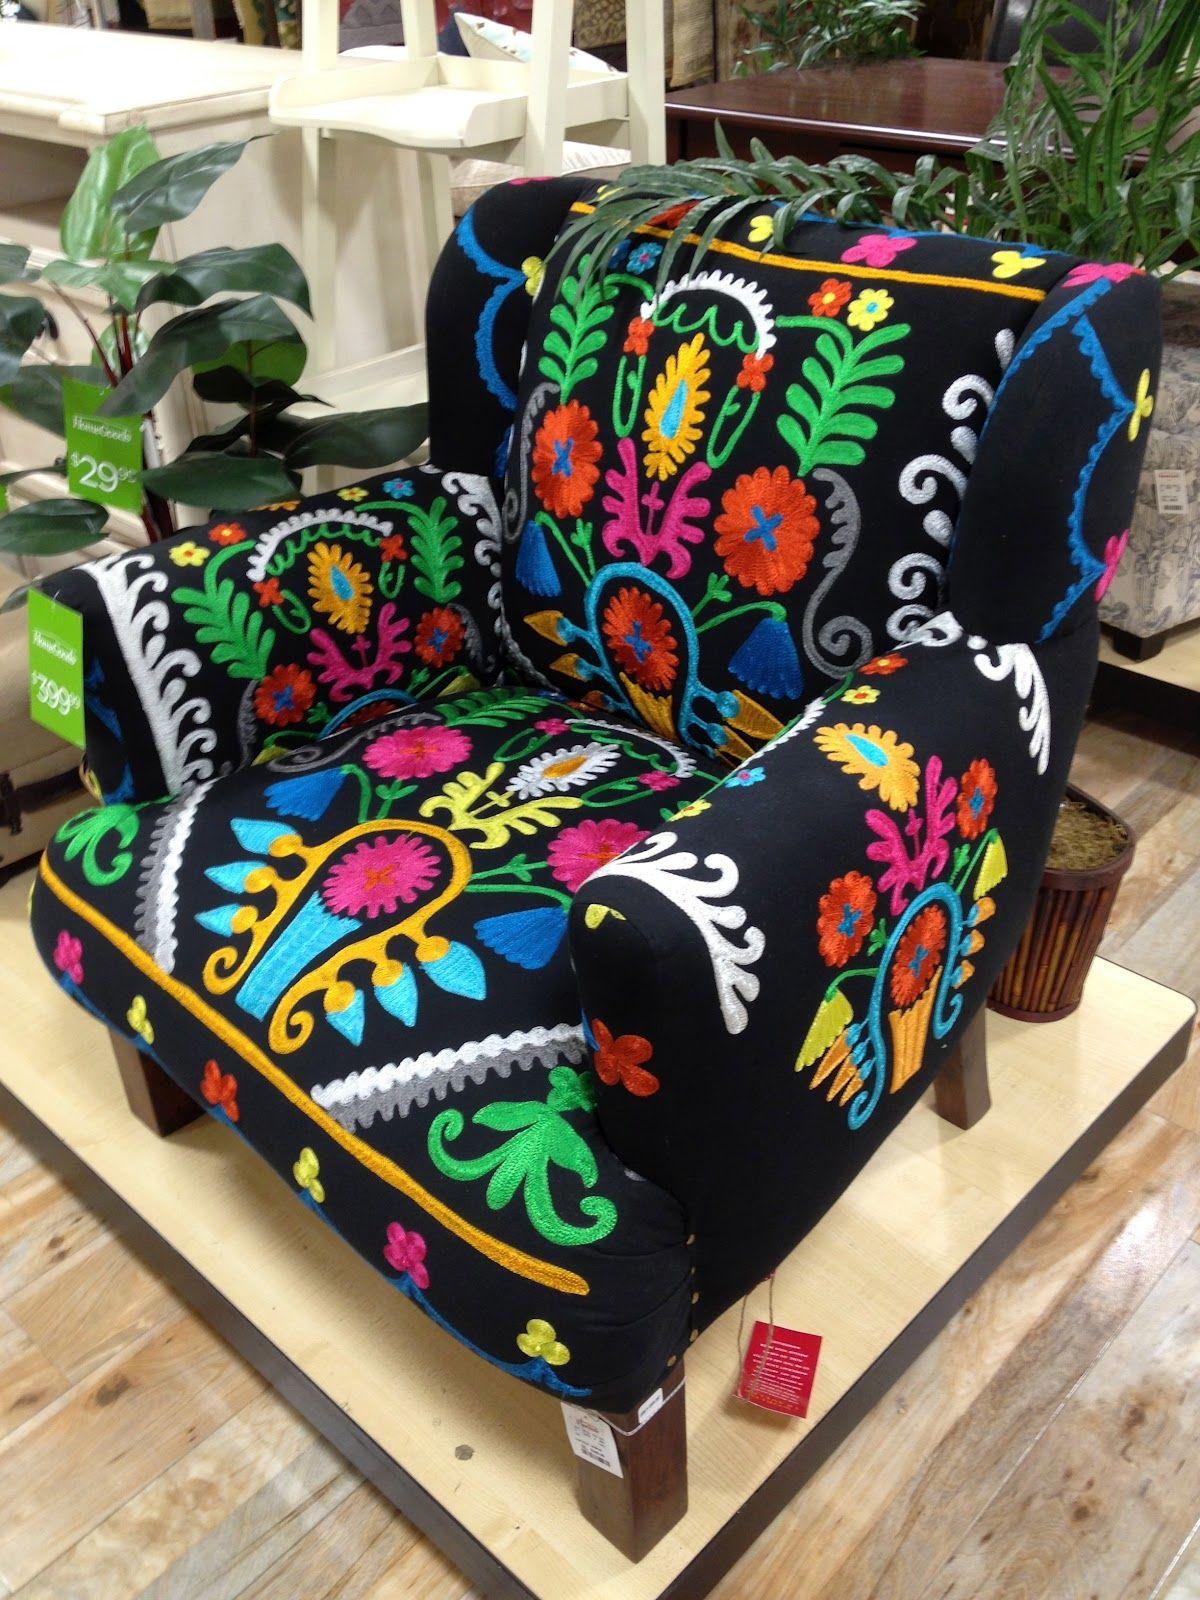 bonkers for bohemian interiors folk art armchairs and bohemian